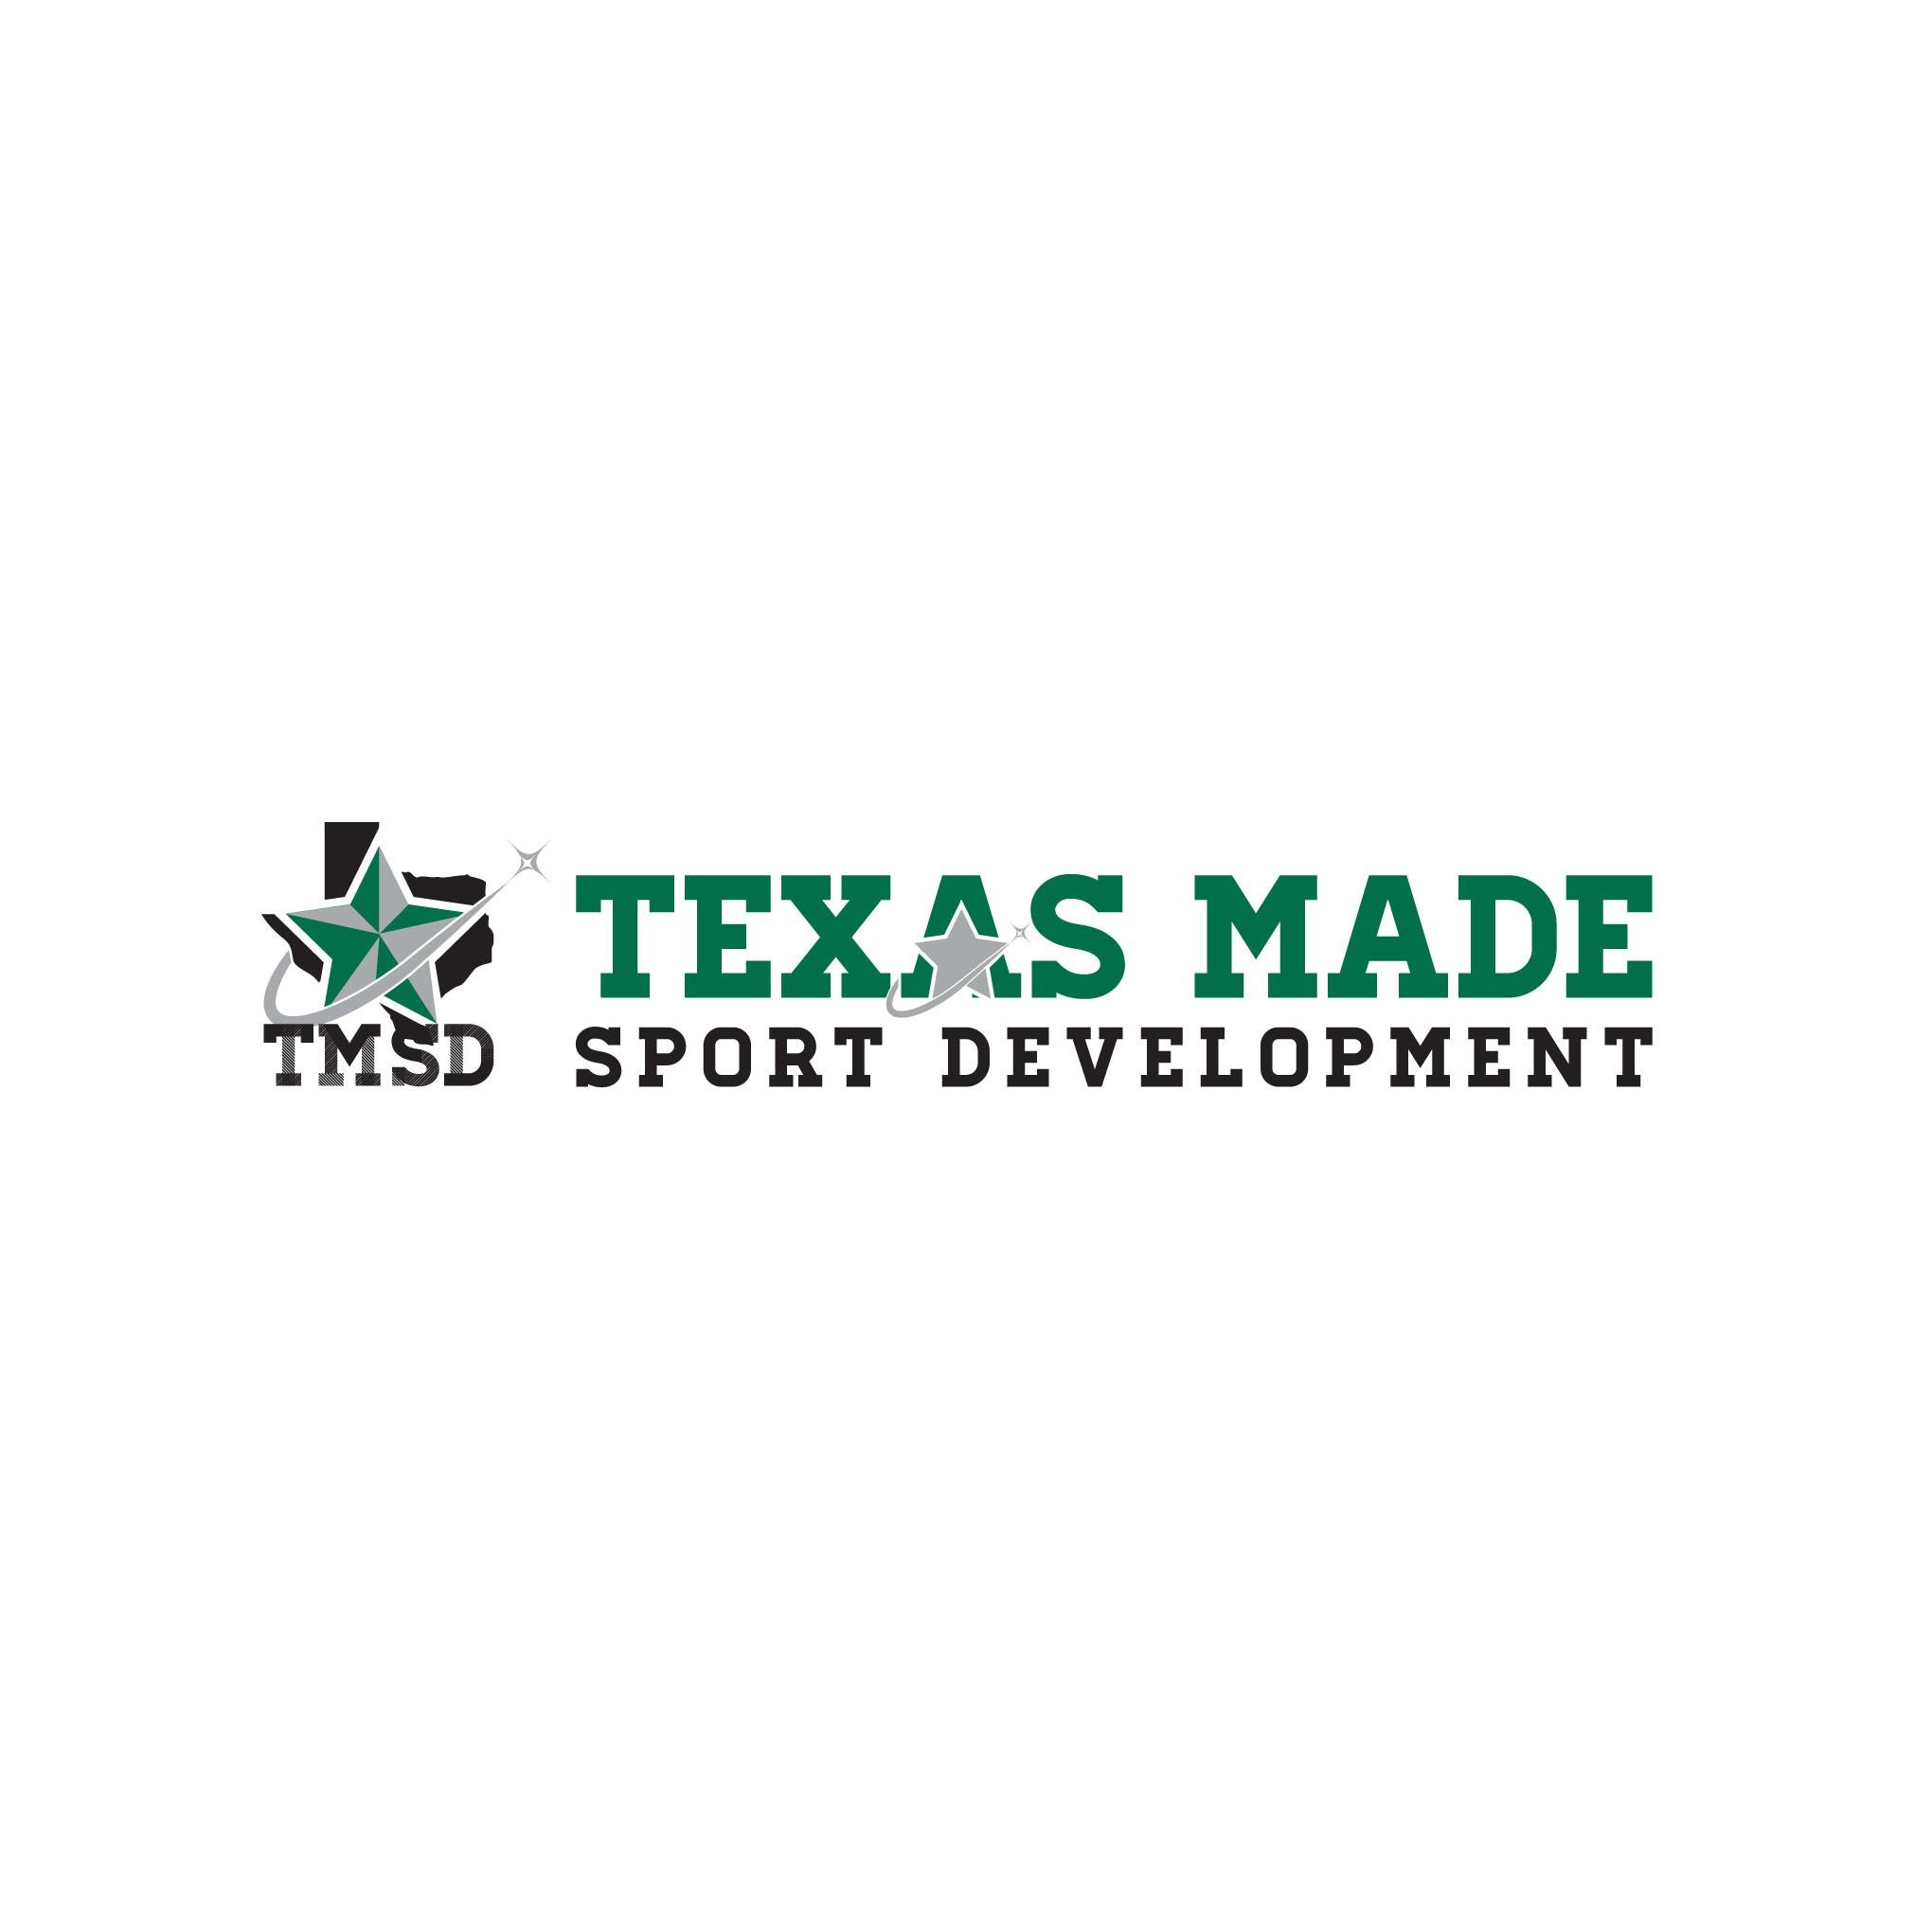 Multi-sport facility operator seeks cutting edge logo